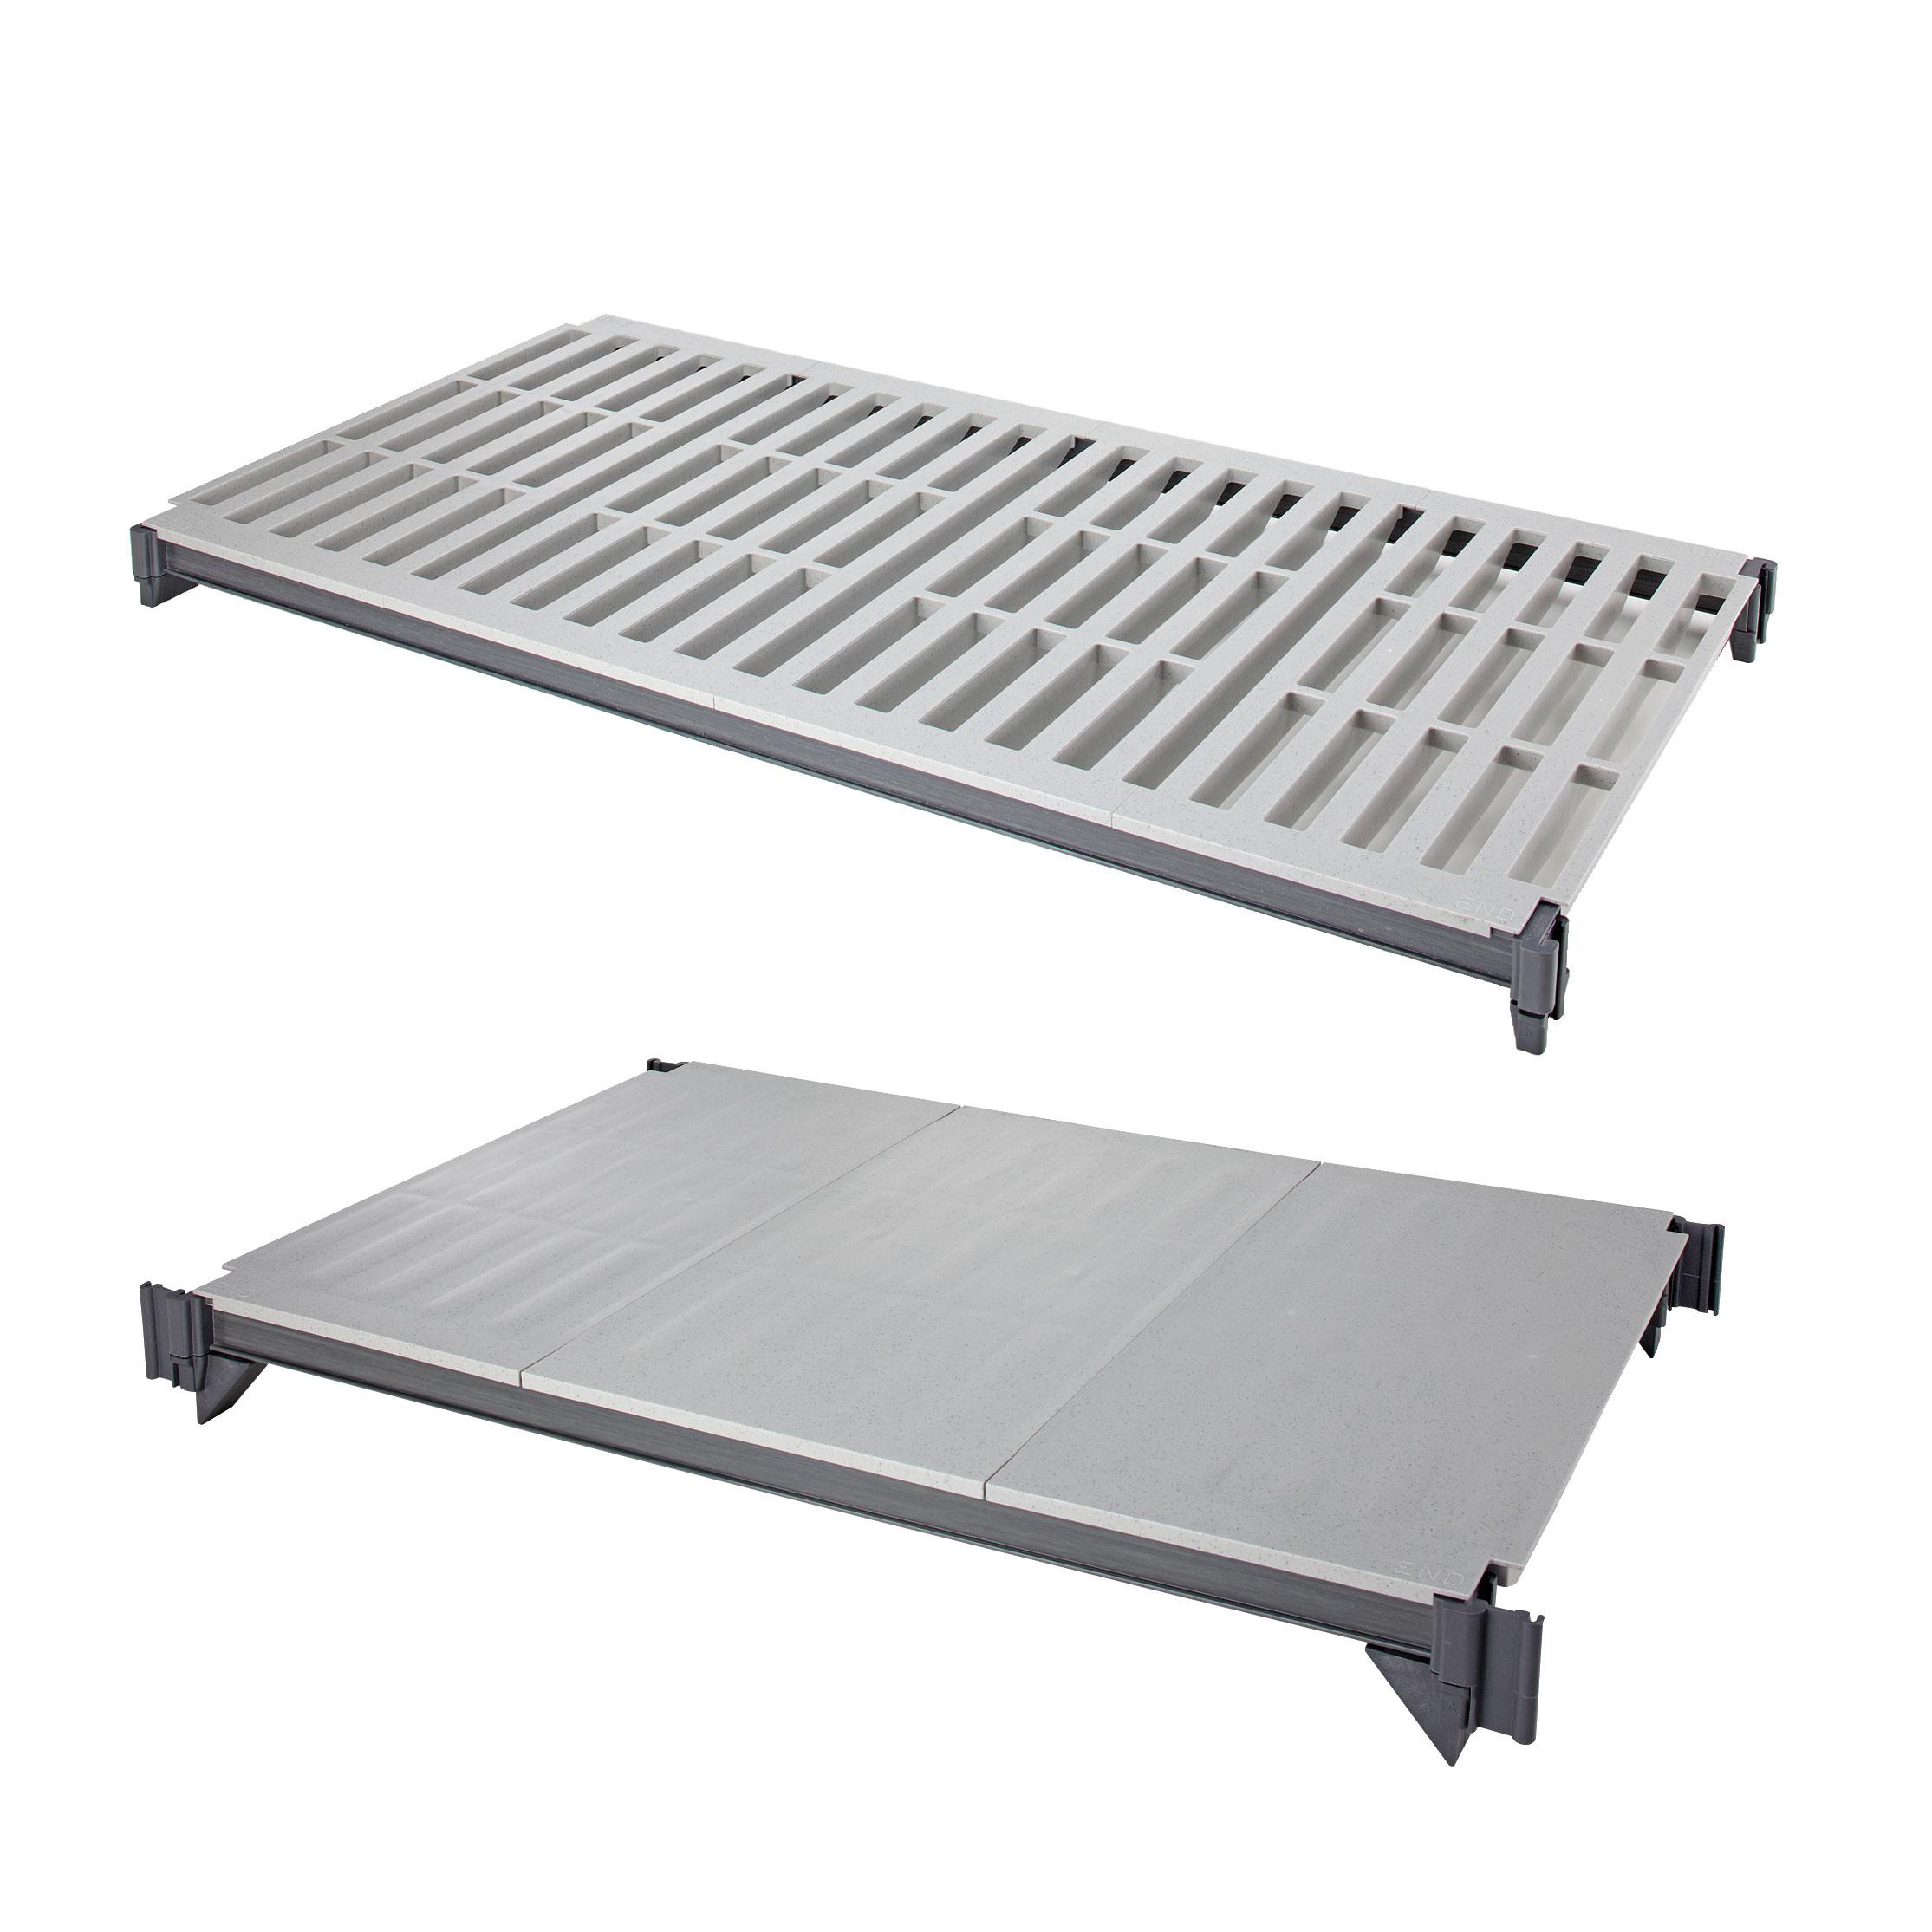 Cambro CBSK2148VS5580 shelving/shelving systems